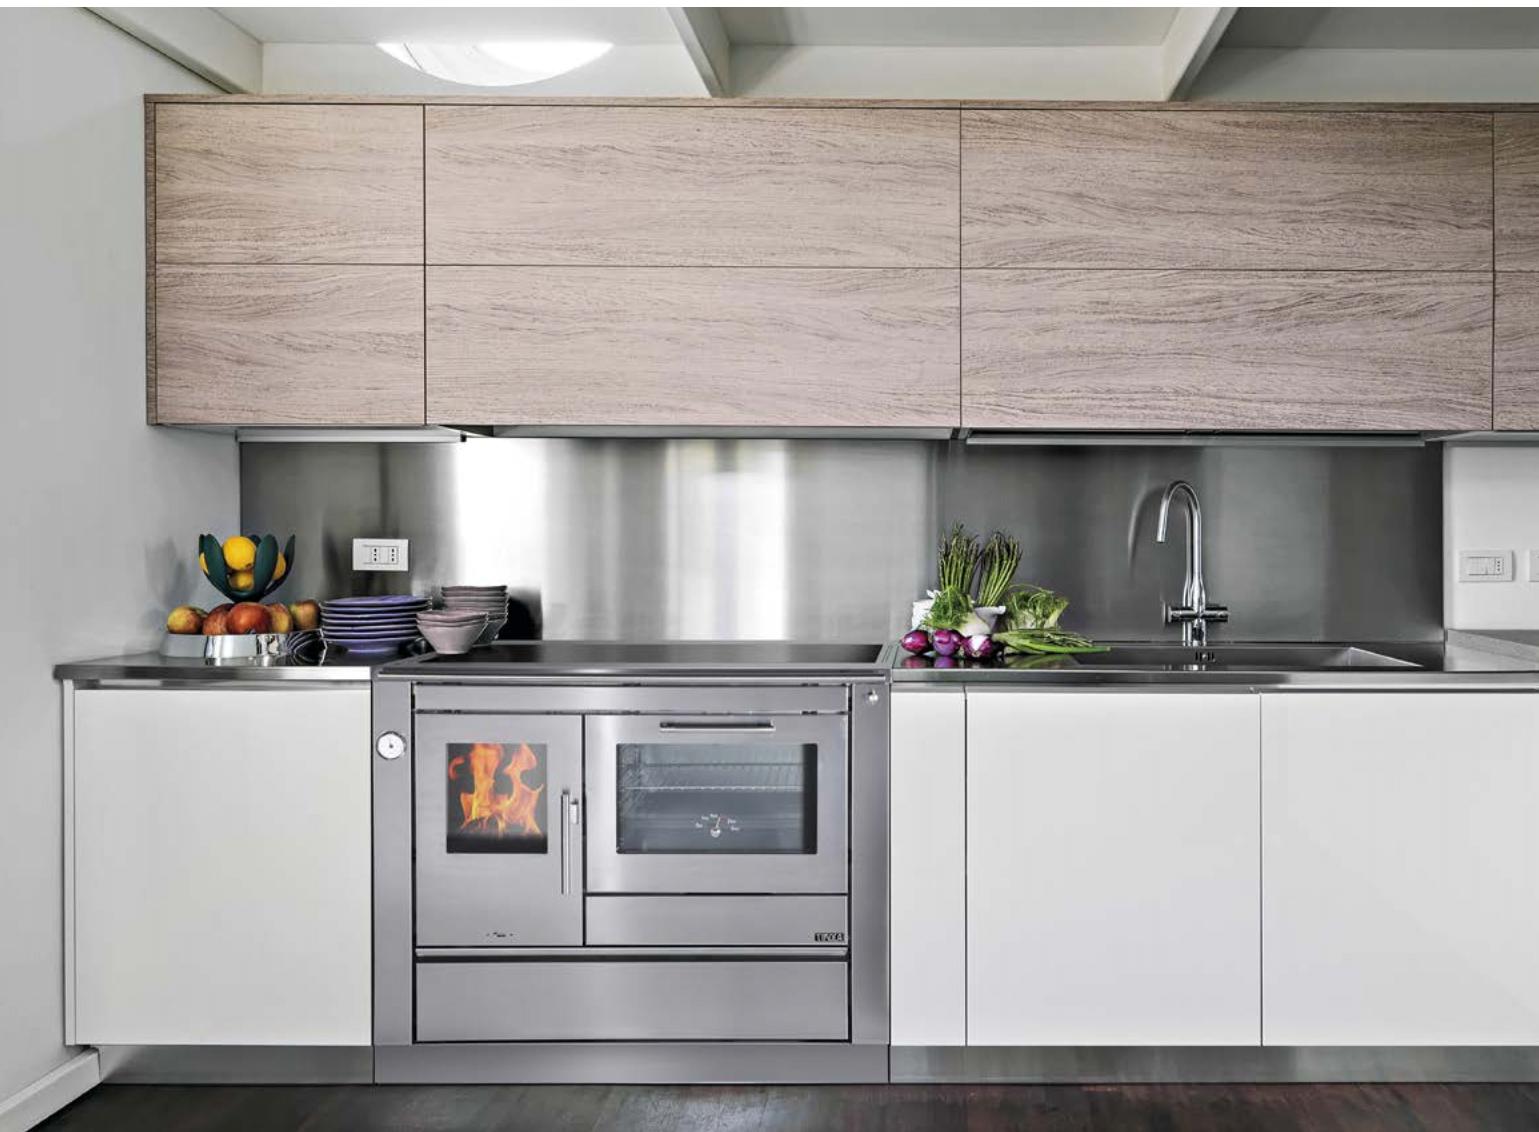 Holzherd Küche günstig - Ofenhaus Mainspitze